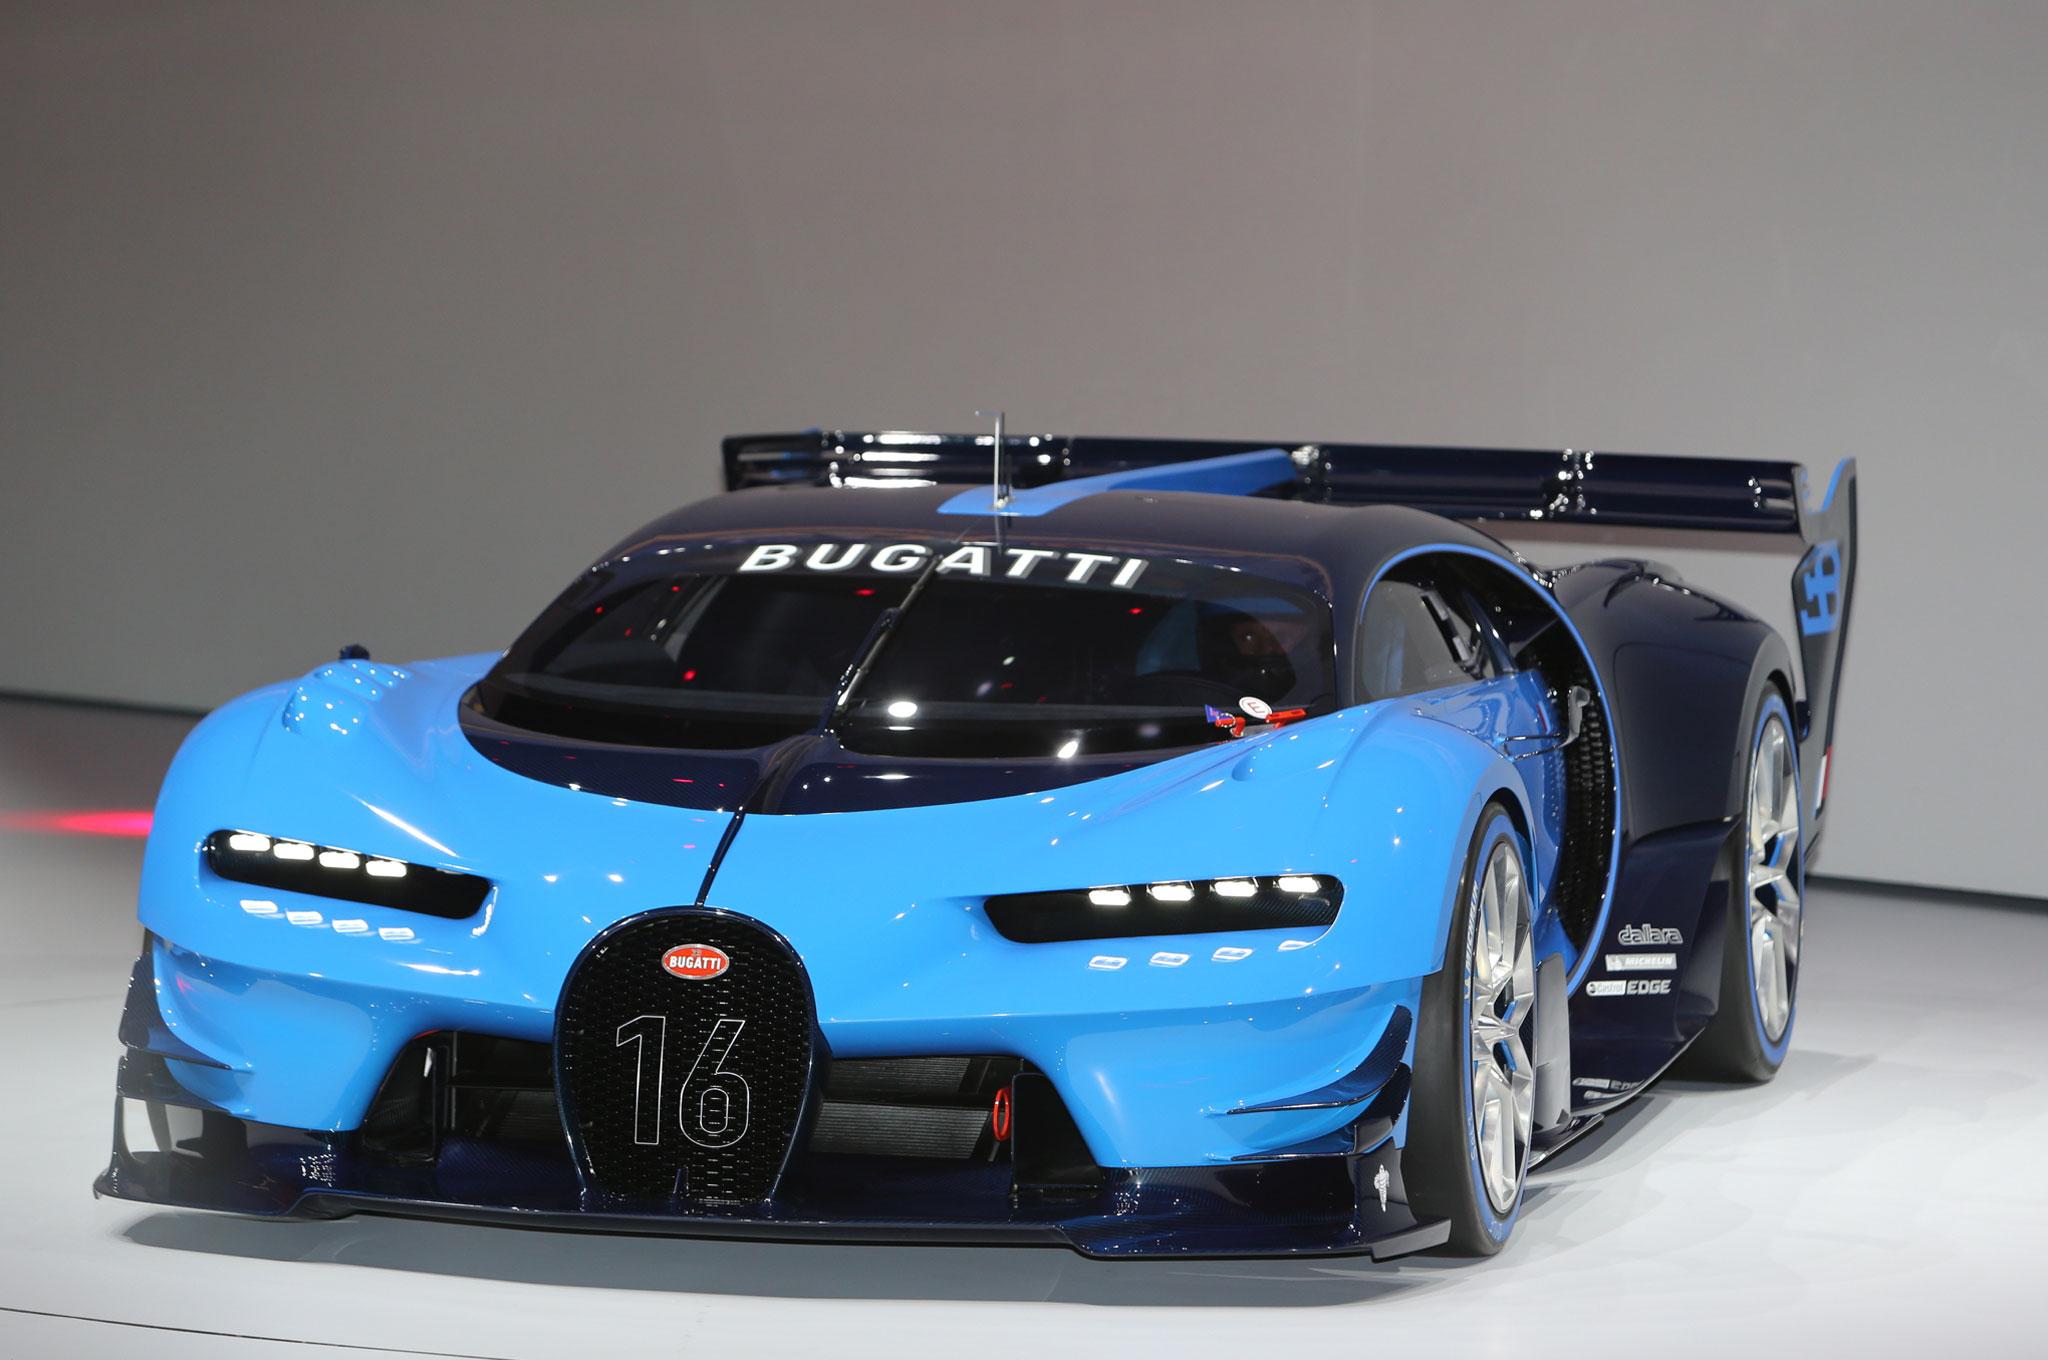 take a look behind the scenes of the bugatti vision gran turismo